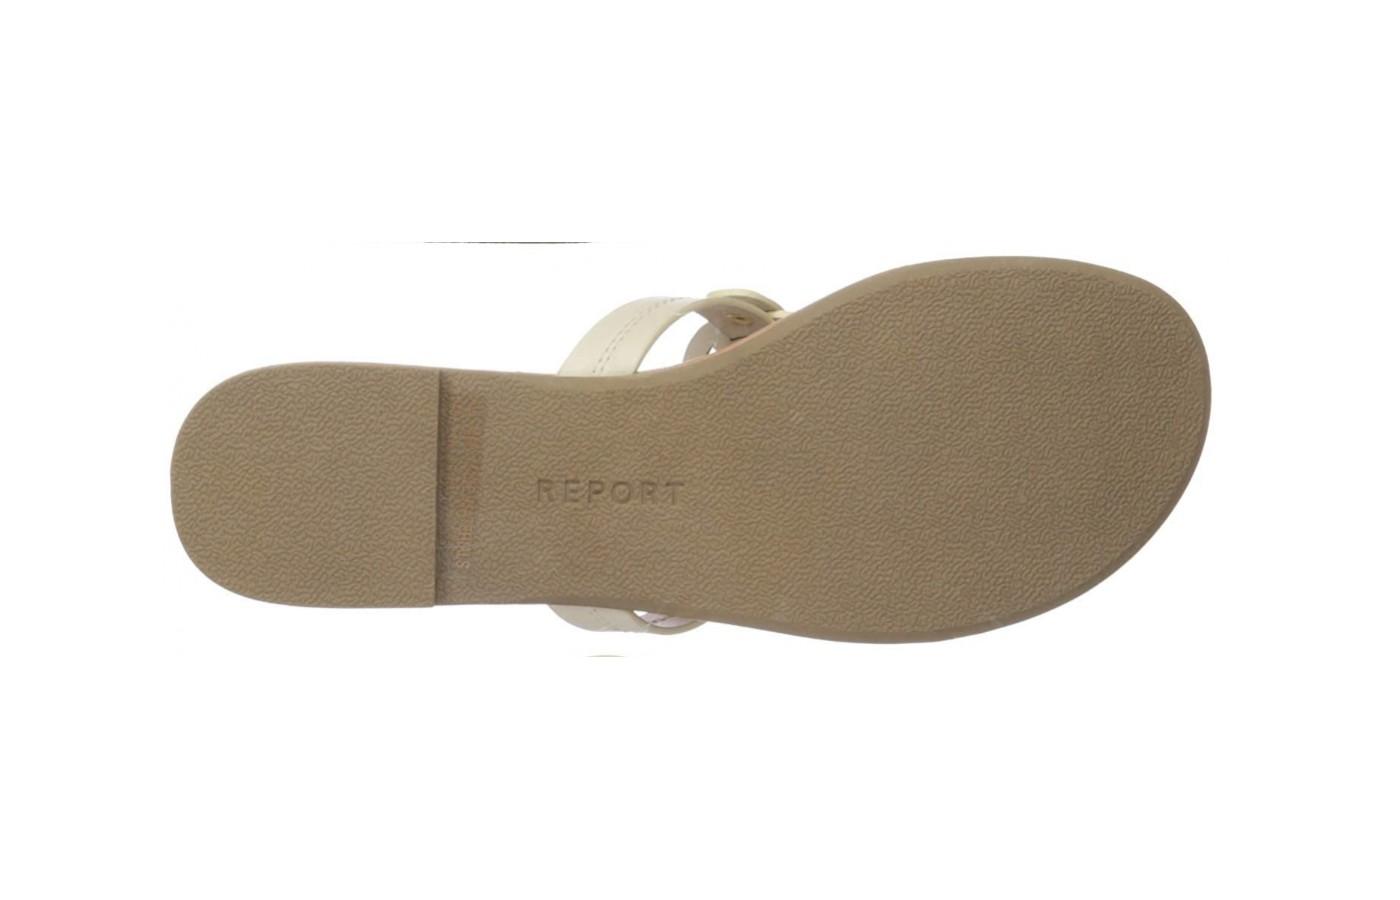 Report Genie Flip-Flop Sole